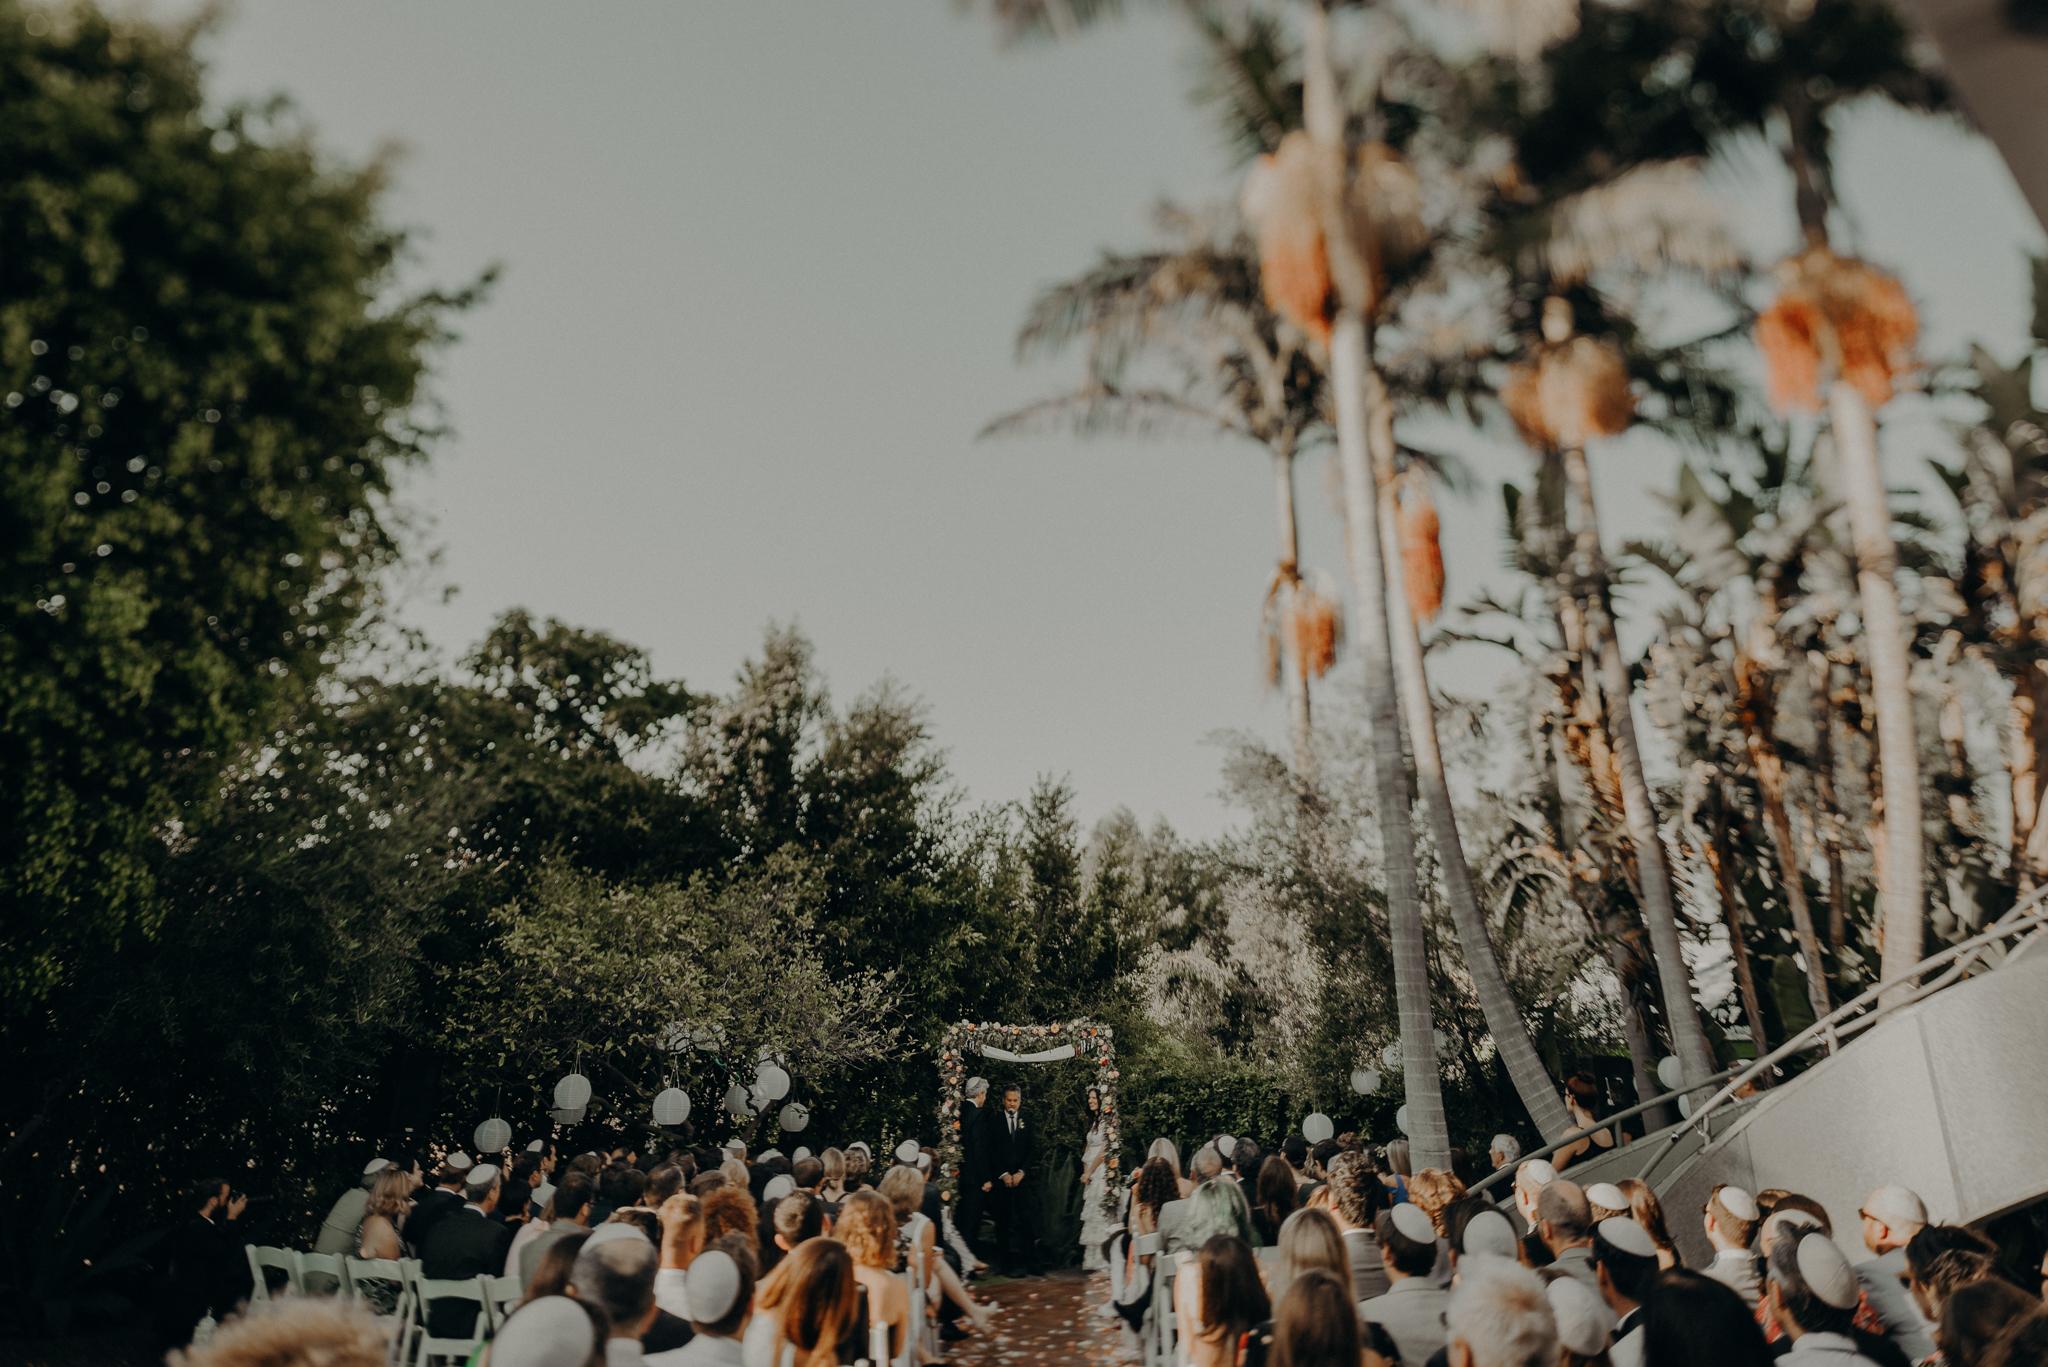 Isaiah + Taylor Photography - Private Estate Backyard Wedding - Beverly Hills - Los Angeles Wedding Photographer - 76.jpg